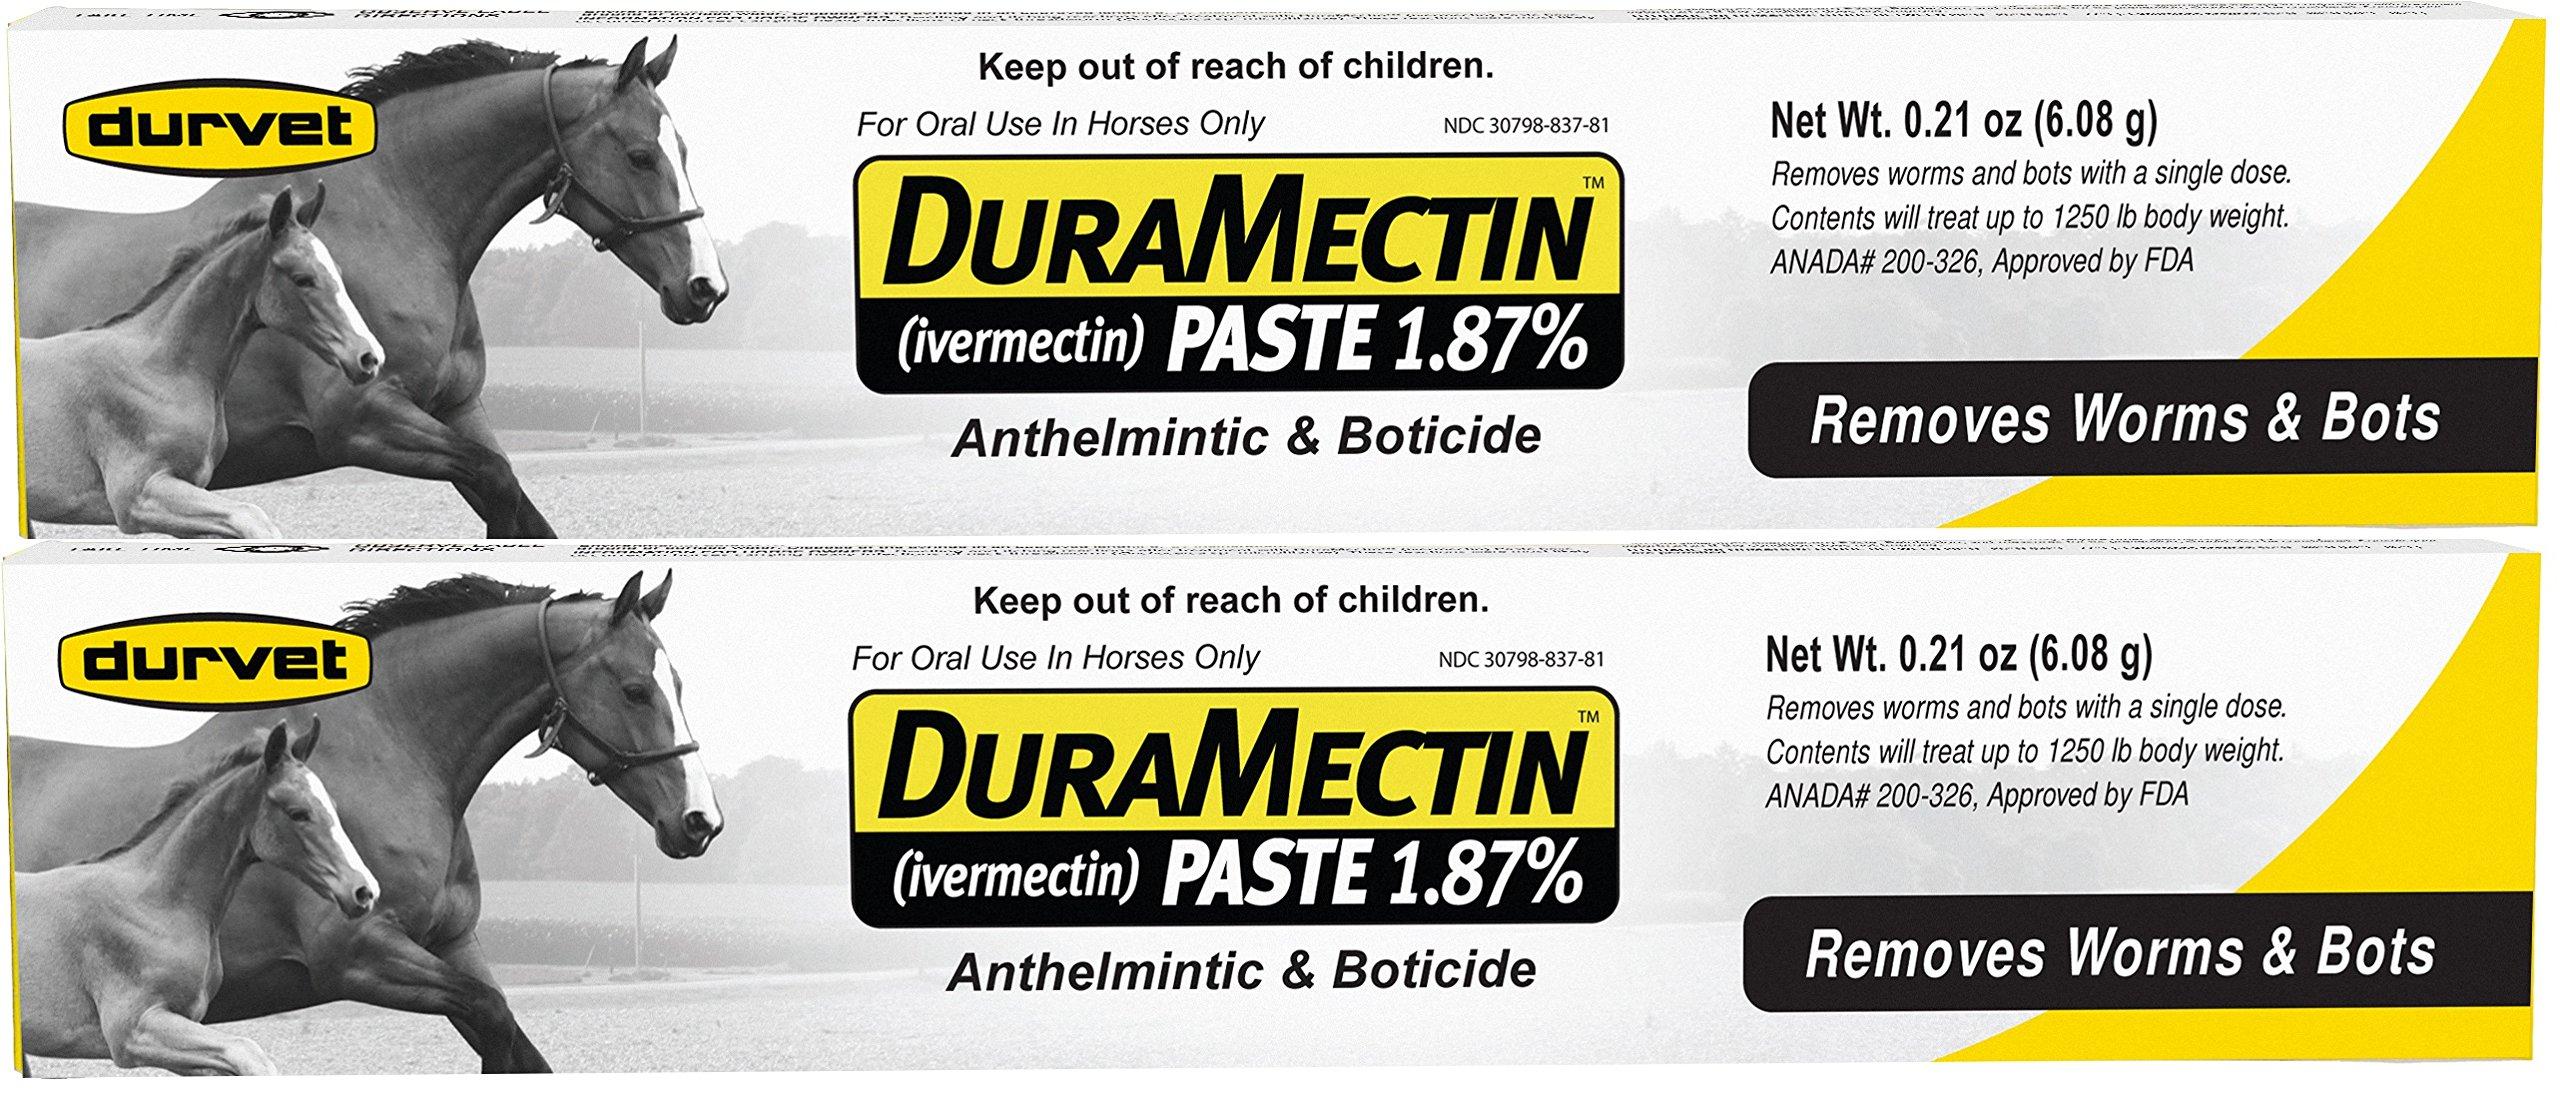 Duramectin Ivermectin Paste 1.87% Horse Wormer (2 Tubes) by Durvet